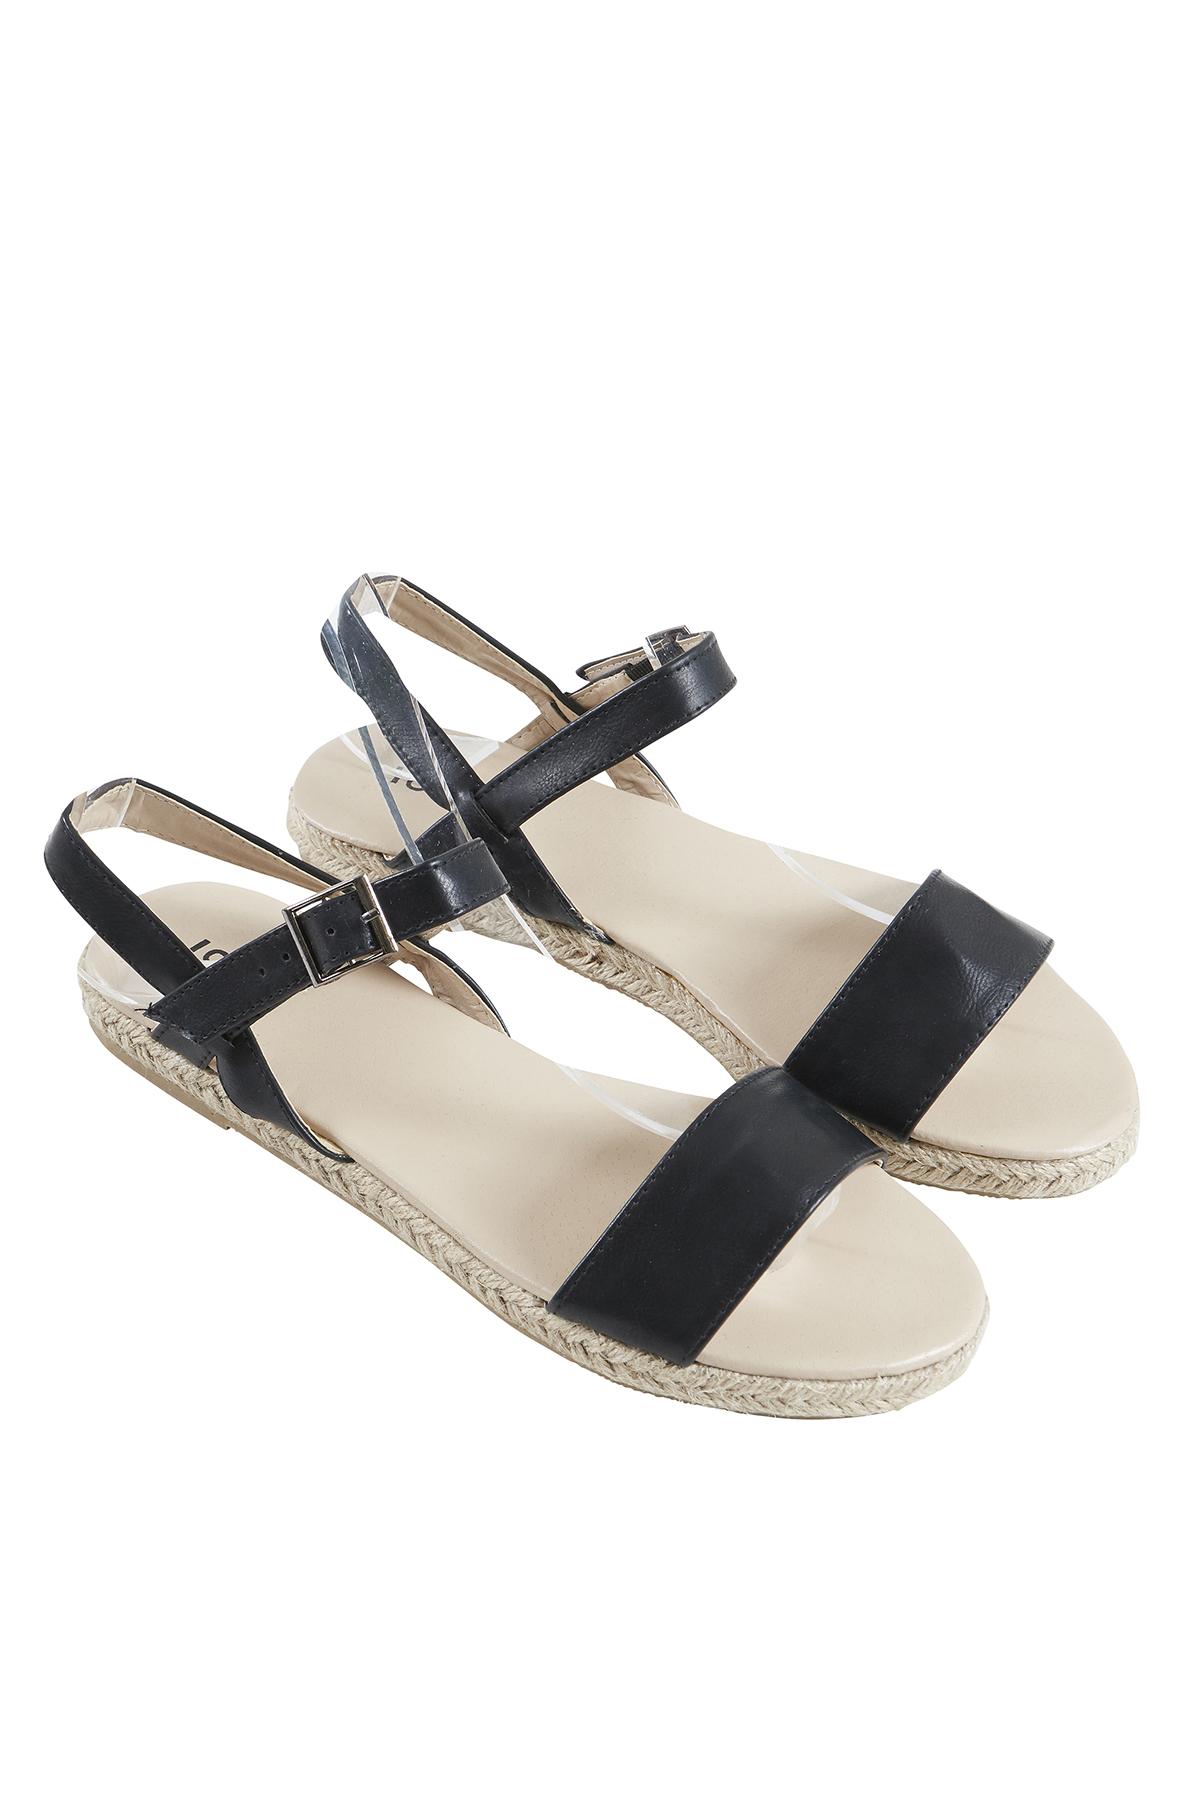 Image of   Ichi - accessories Dame Sandal - Sort